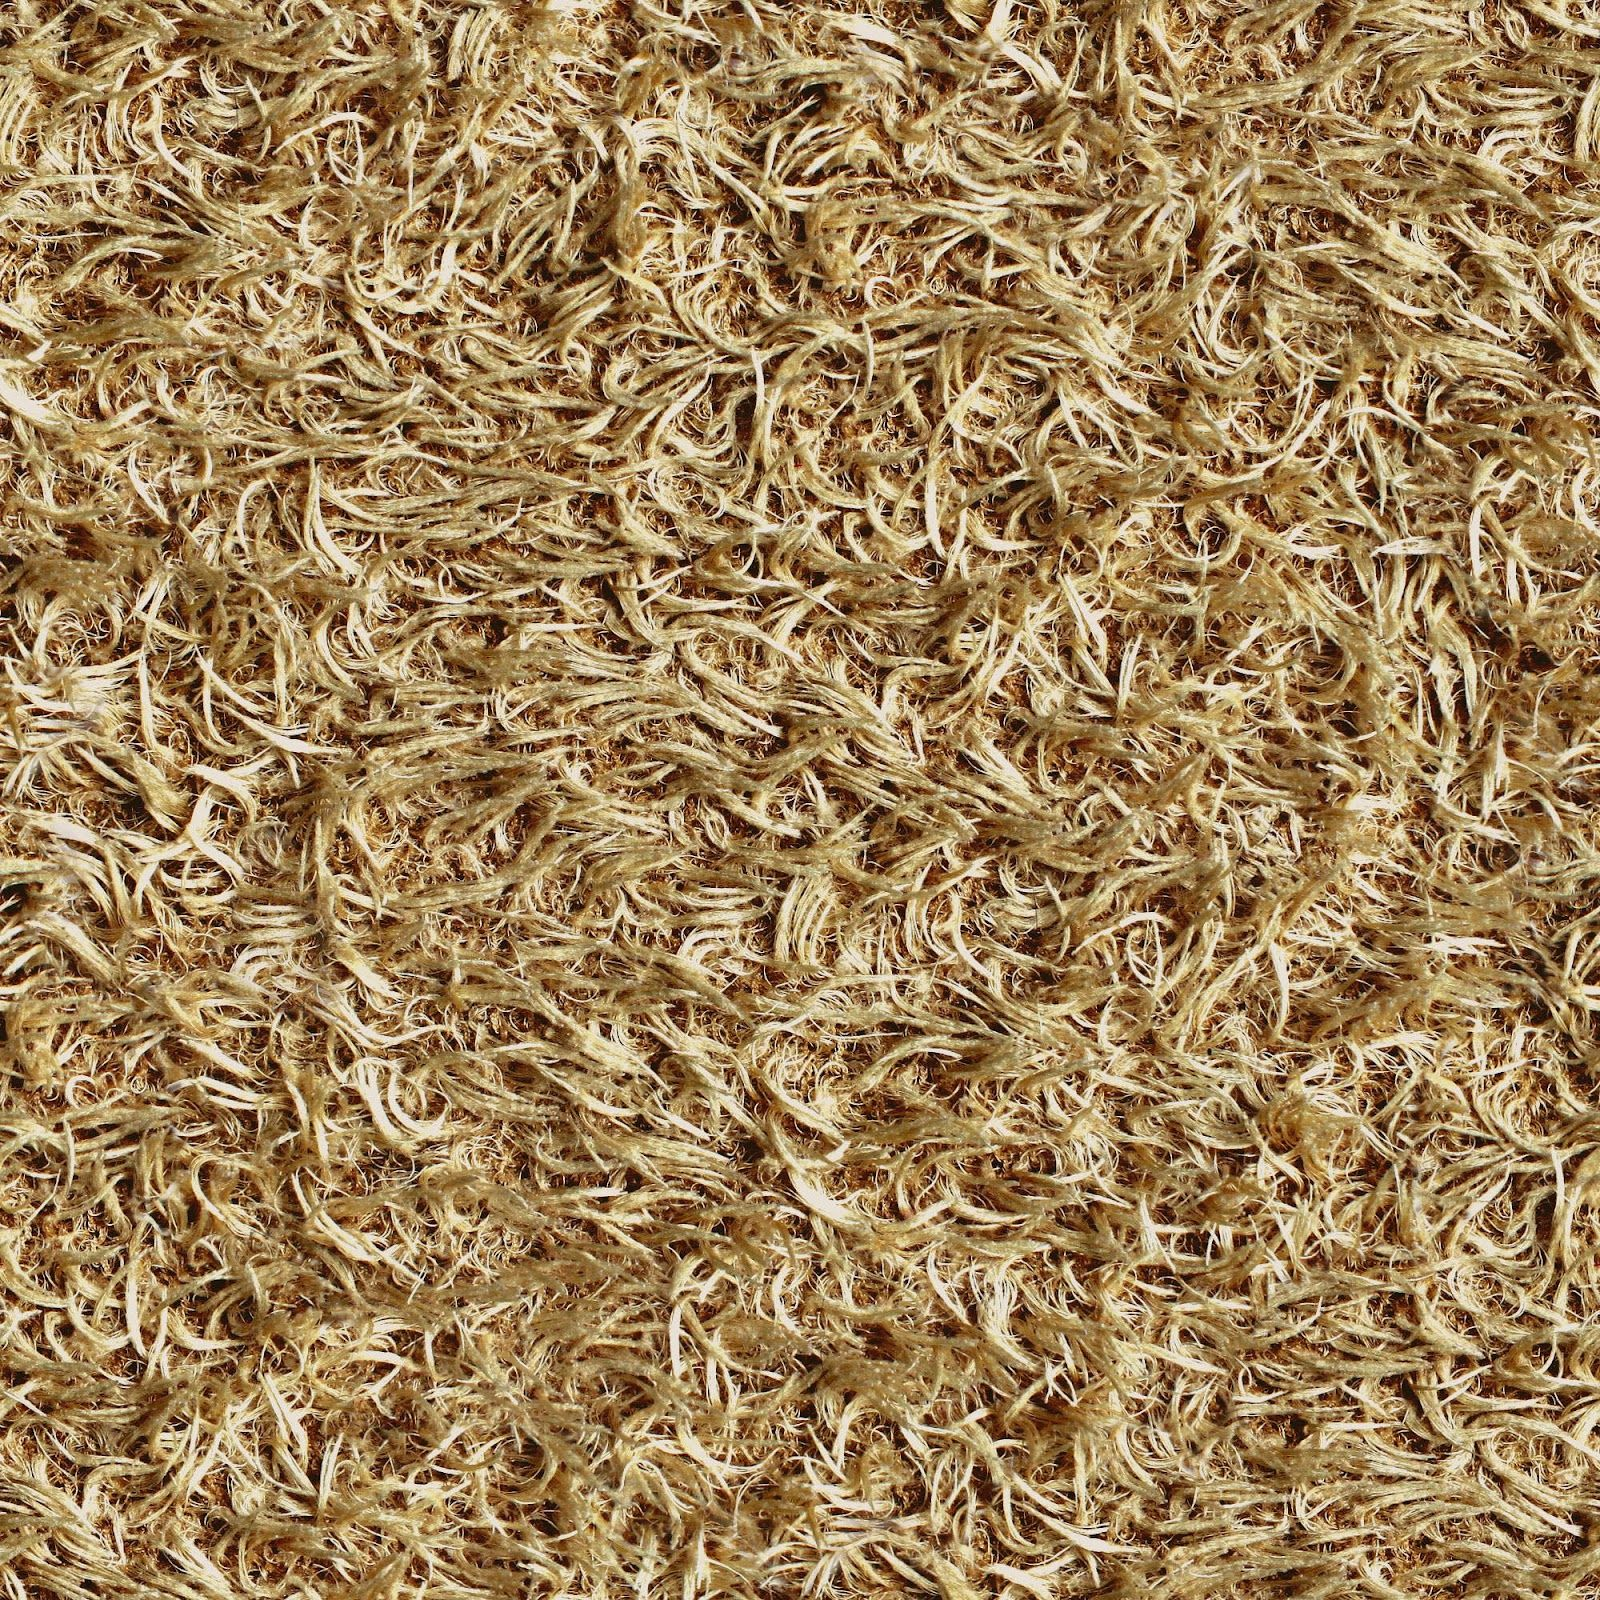 600 High Resolution Textures Free Seamless Fabric Sofa Texture